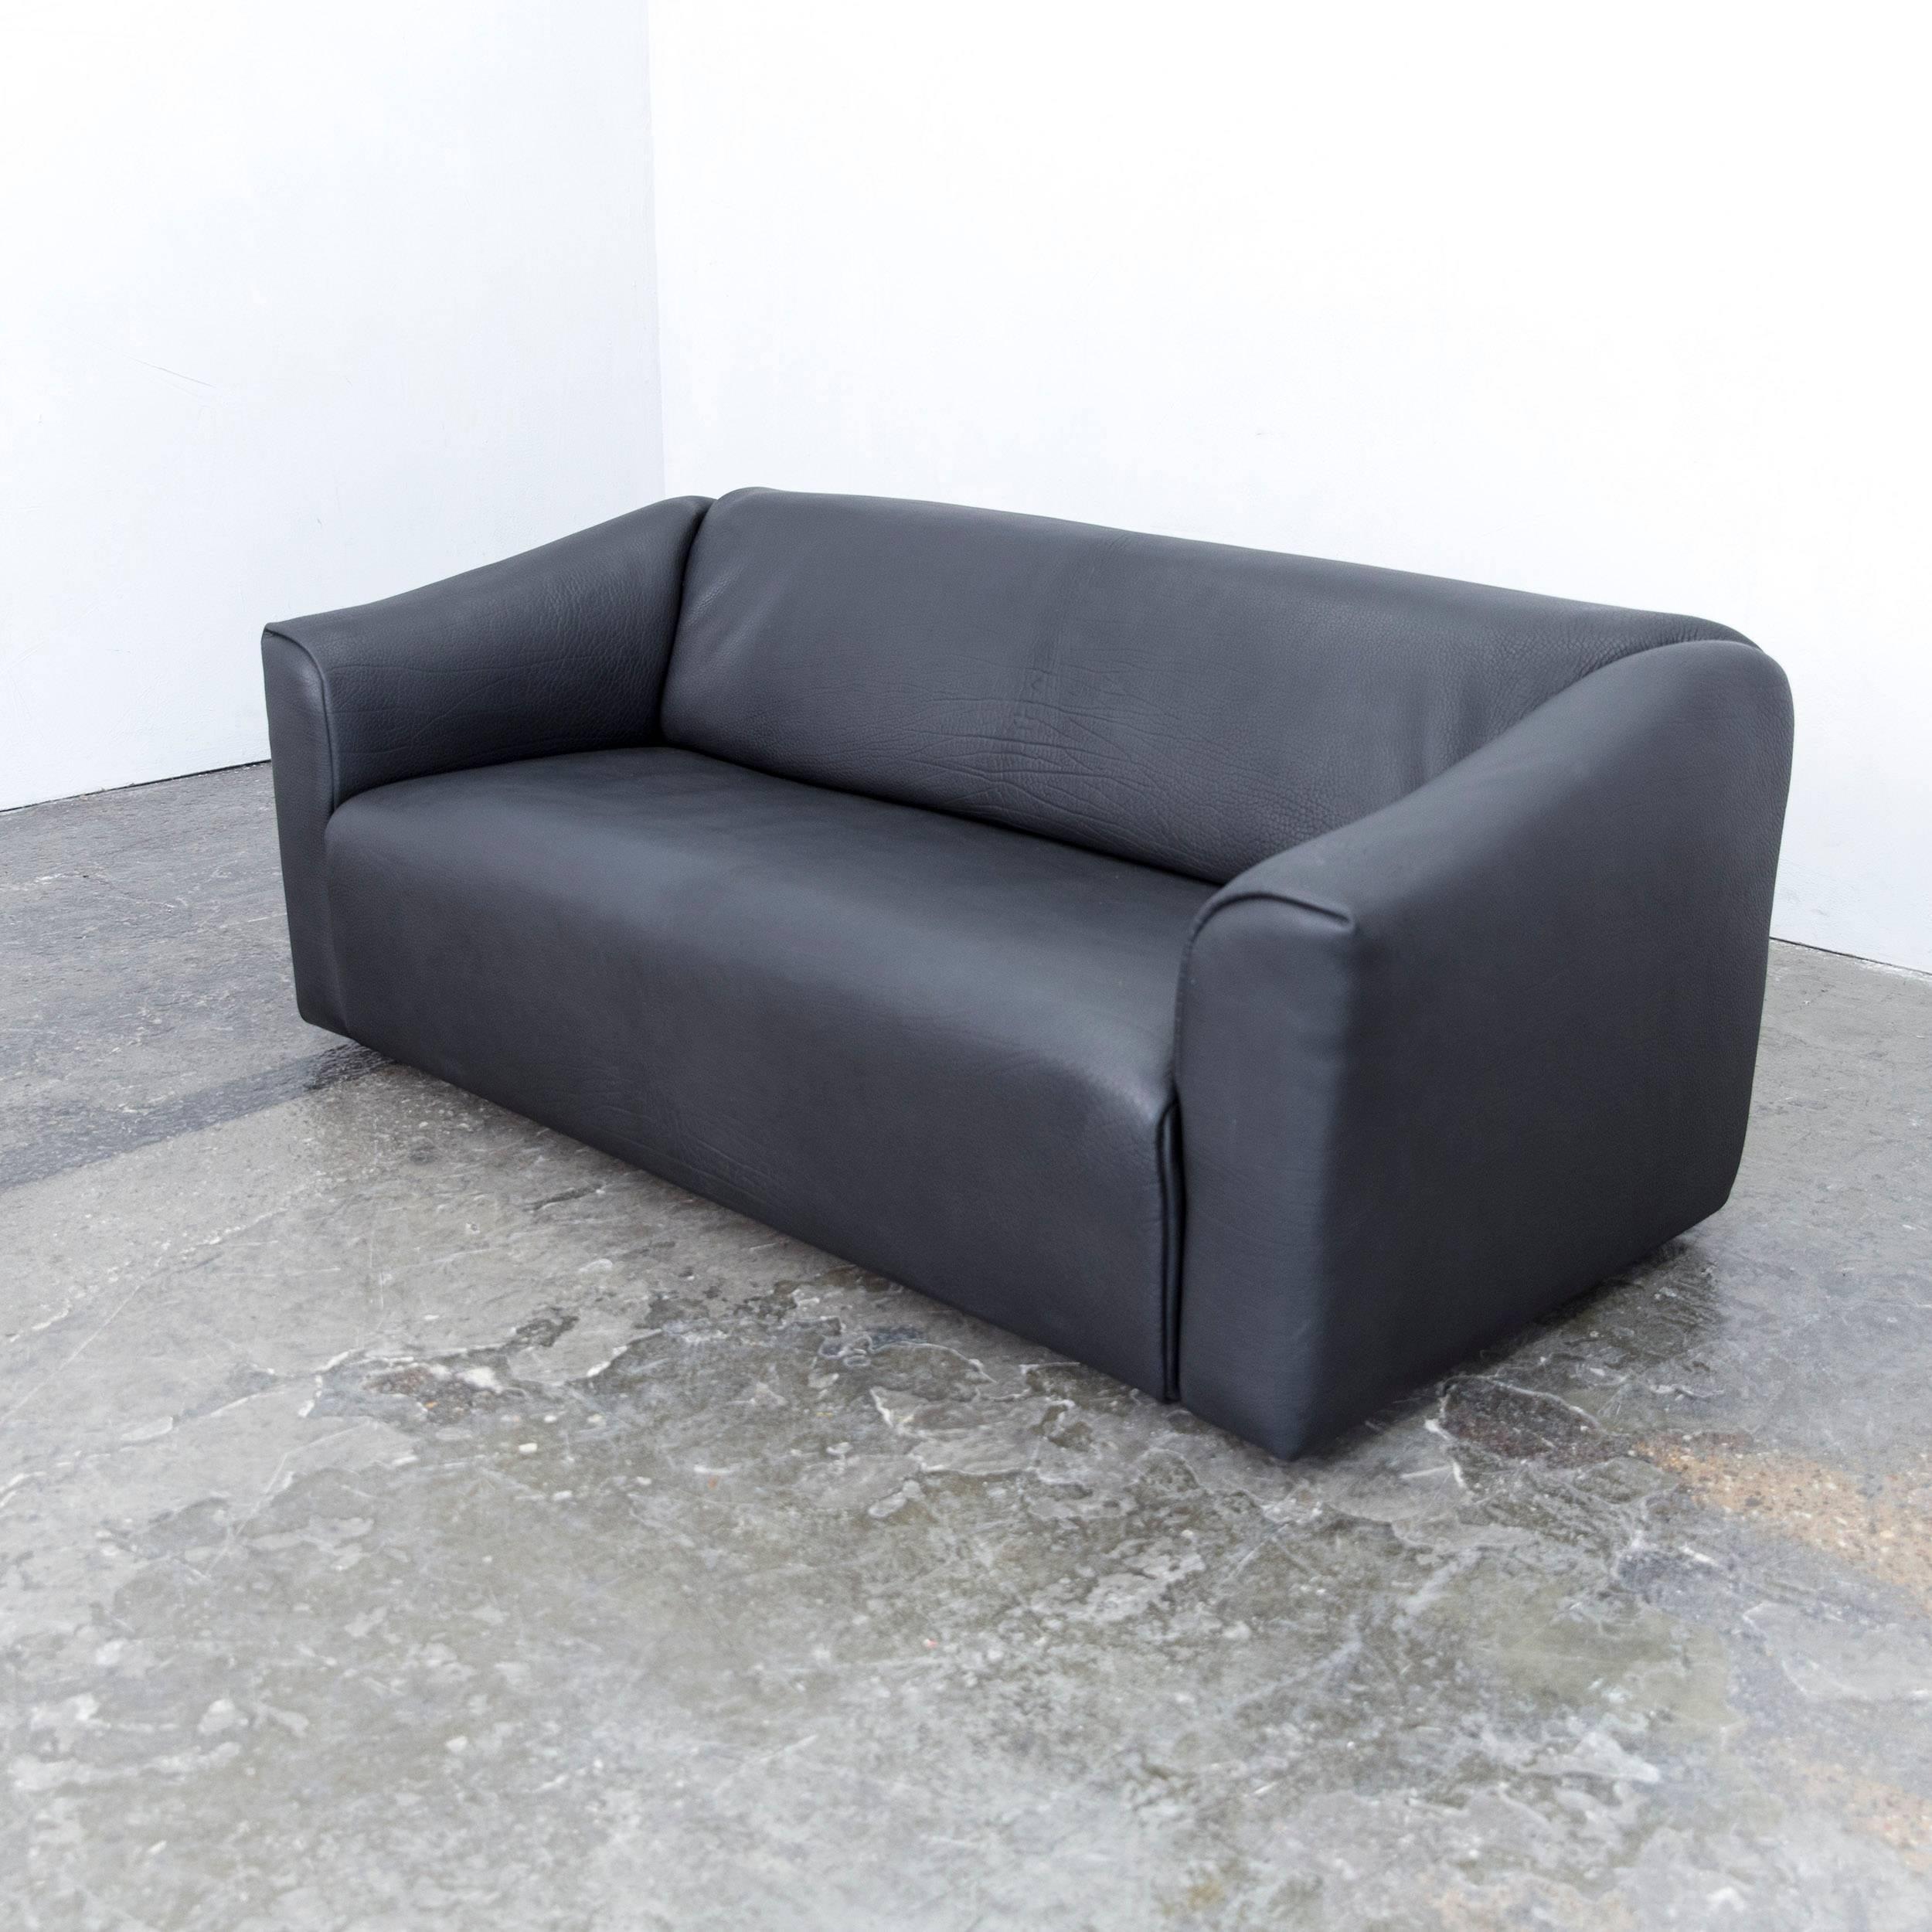 Couch schwarz trendy ecksofa vida xcm webstoff grau kunstleder de sede ds designer sofa neckleather black threeseat function couch modern with couch schwarz parisarafo Image collections